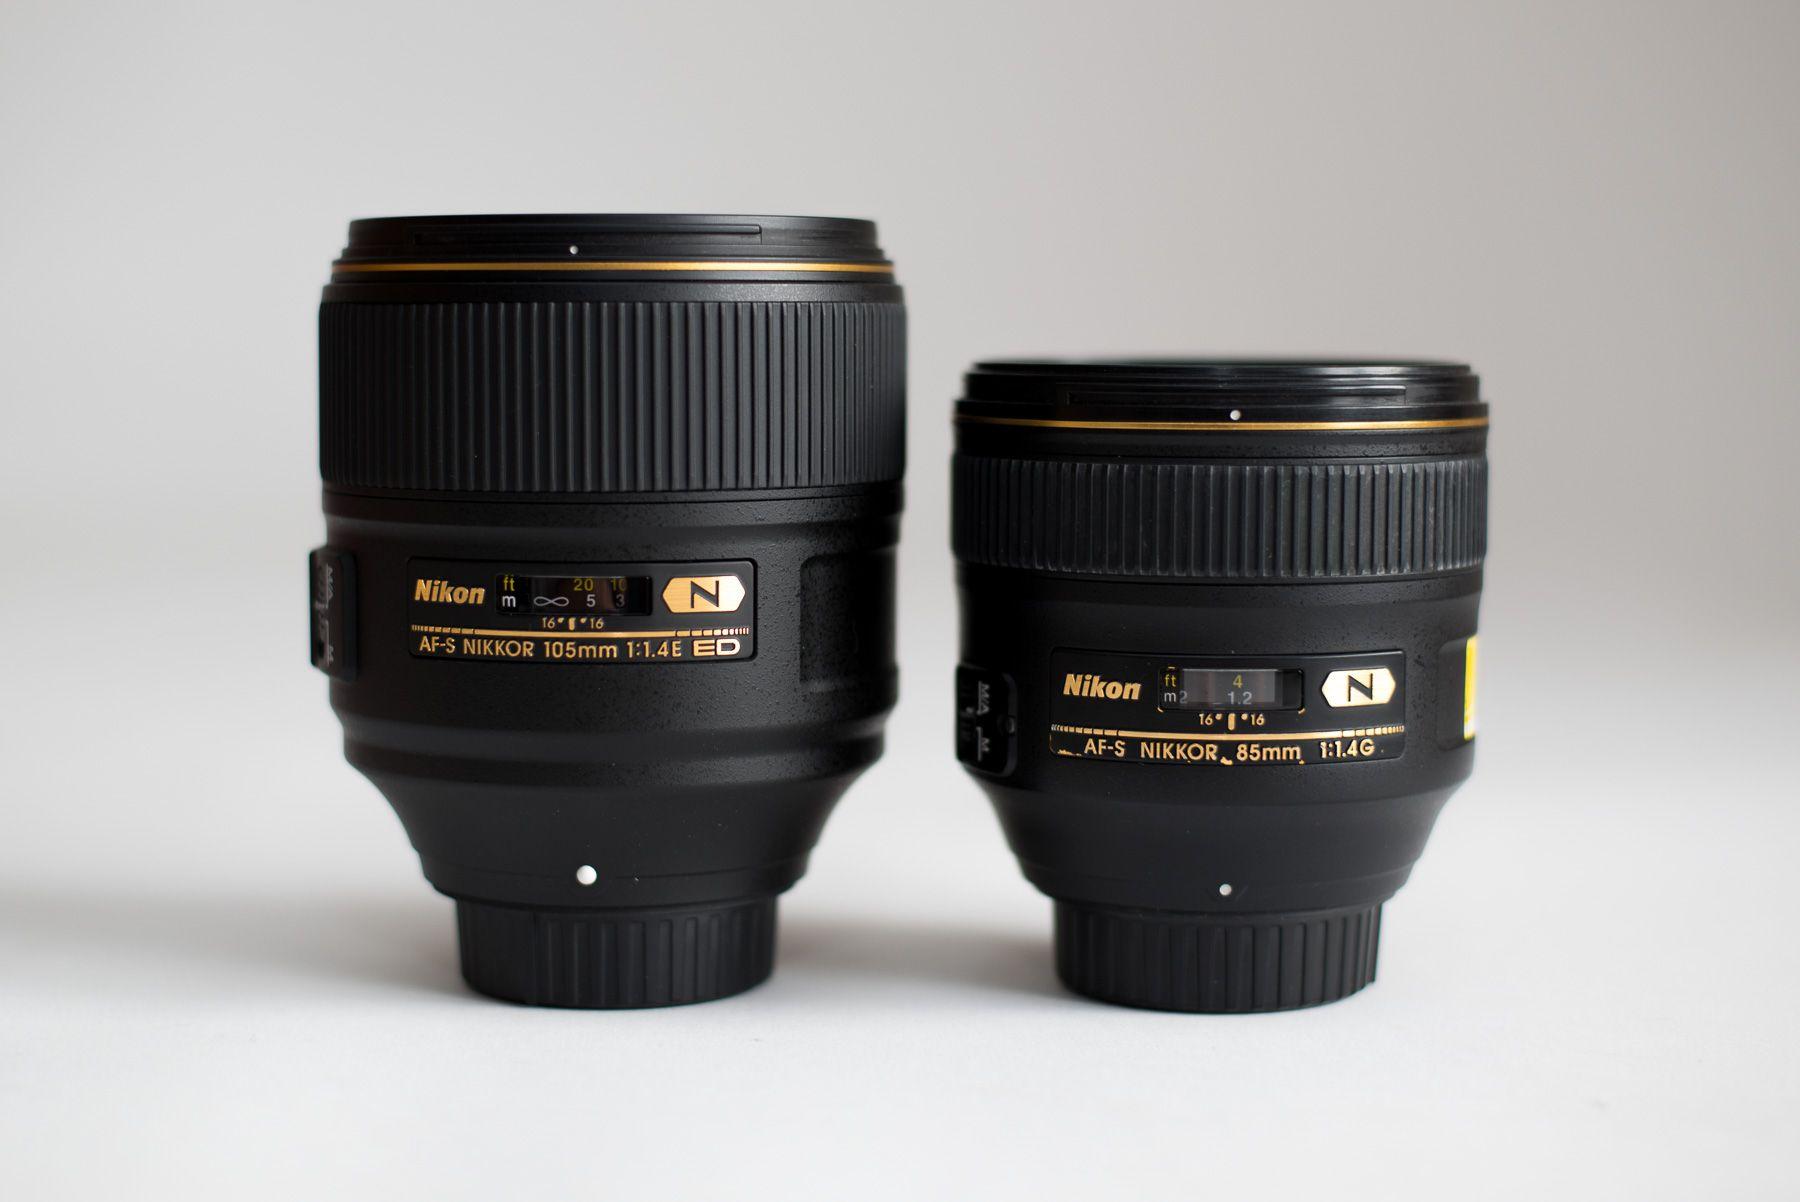 Nikon Af S Nikkor 105mm F 1 4e Ed Review And Comparison With The Nikkor 85mm F 1 4g Lens Nikon Rumors Camera Nikon Nikon Nikon Lenses